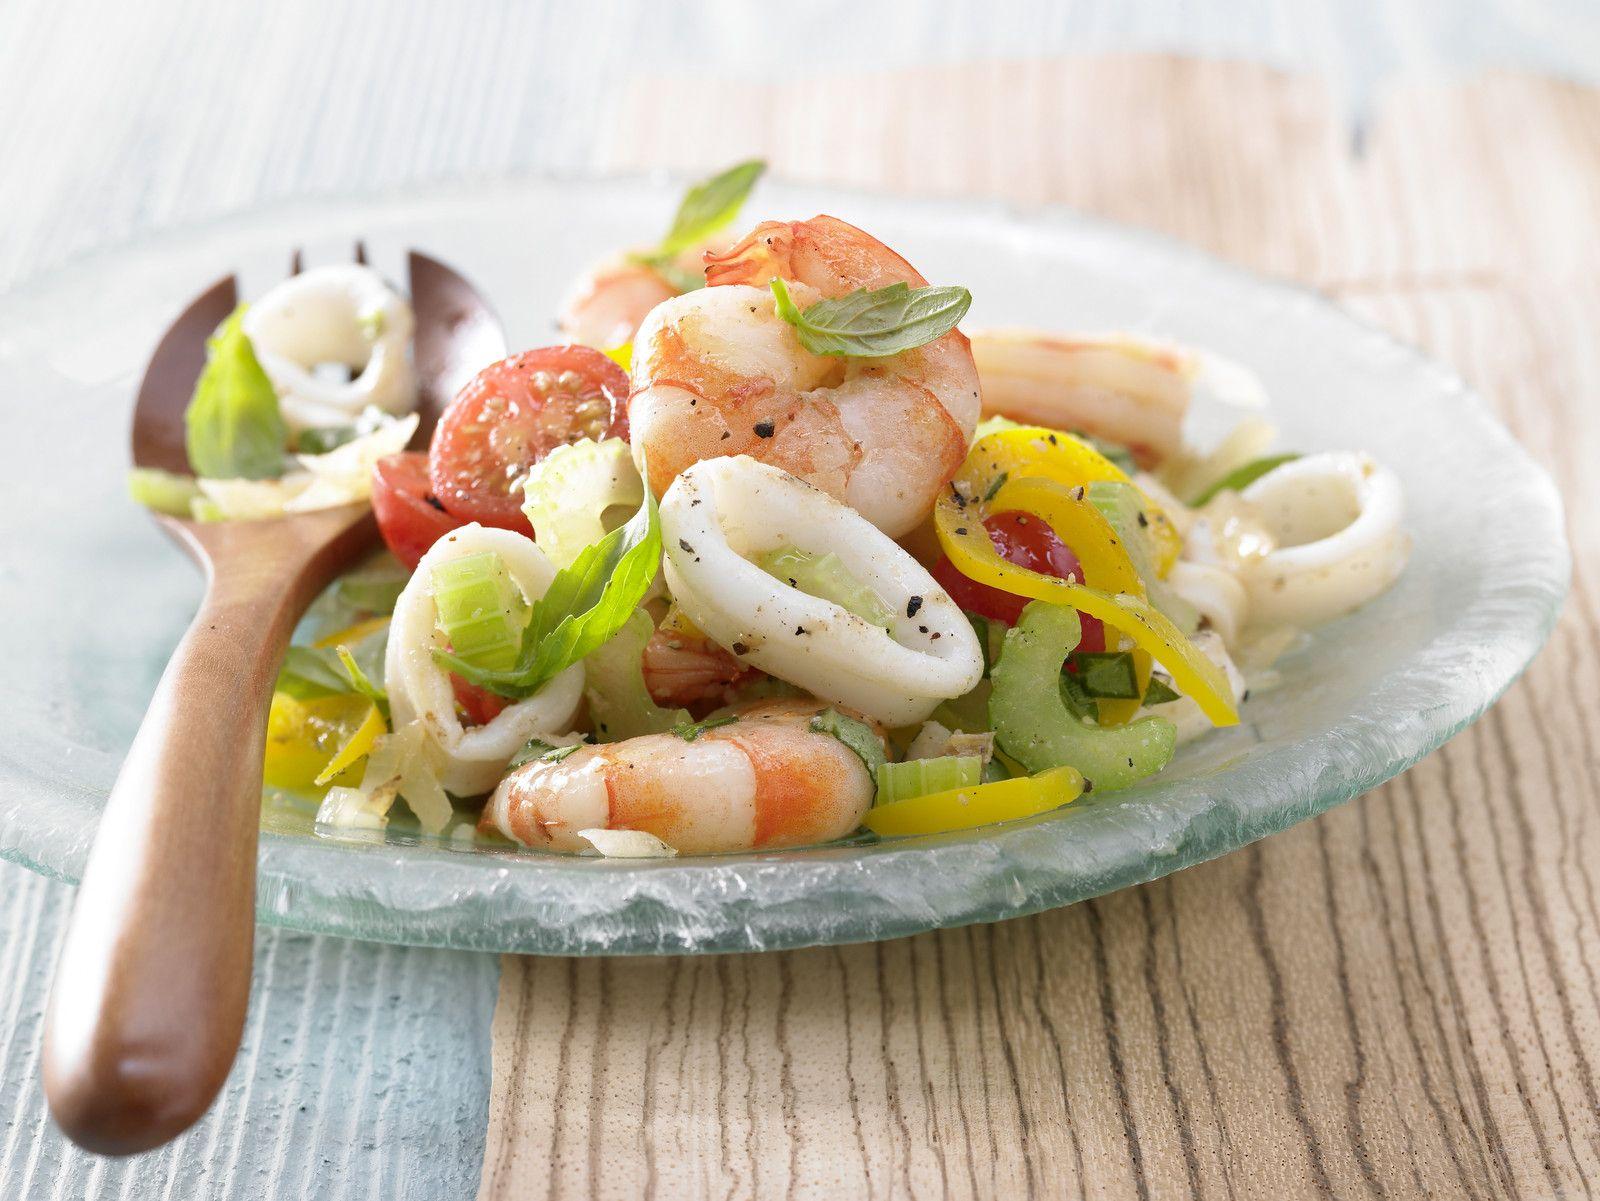 Mögt Ihr Meeresfrüchte? Meeresfrüchtesalat - mit Tomaten und Oliven - smarter - Kalorien: 423 Kcal - Zeit: 30 Min. | eatsmarter.de